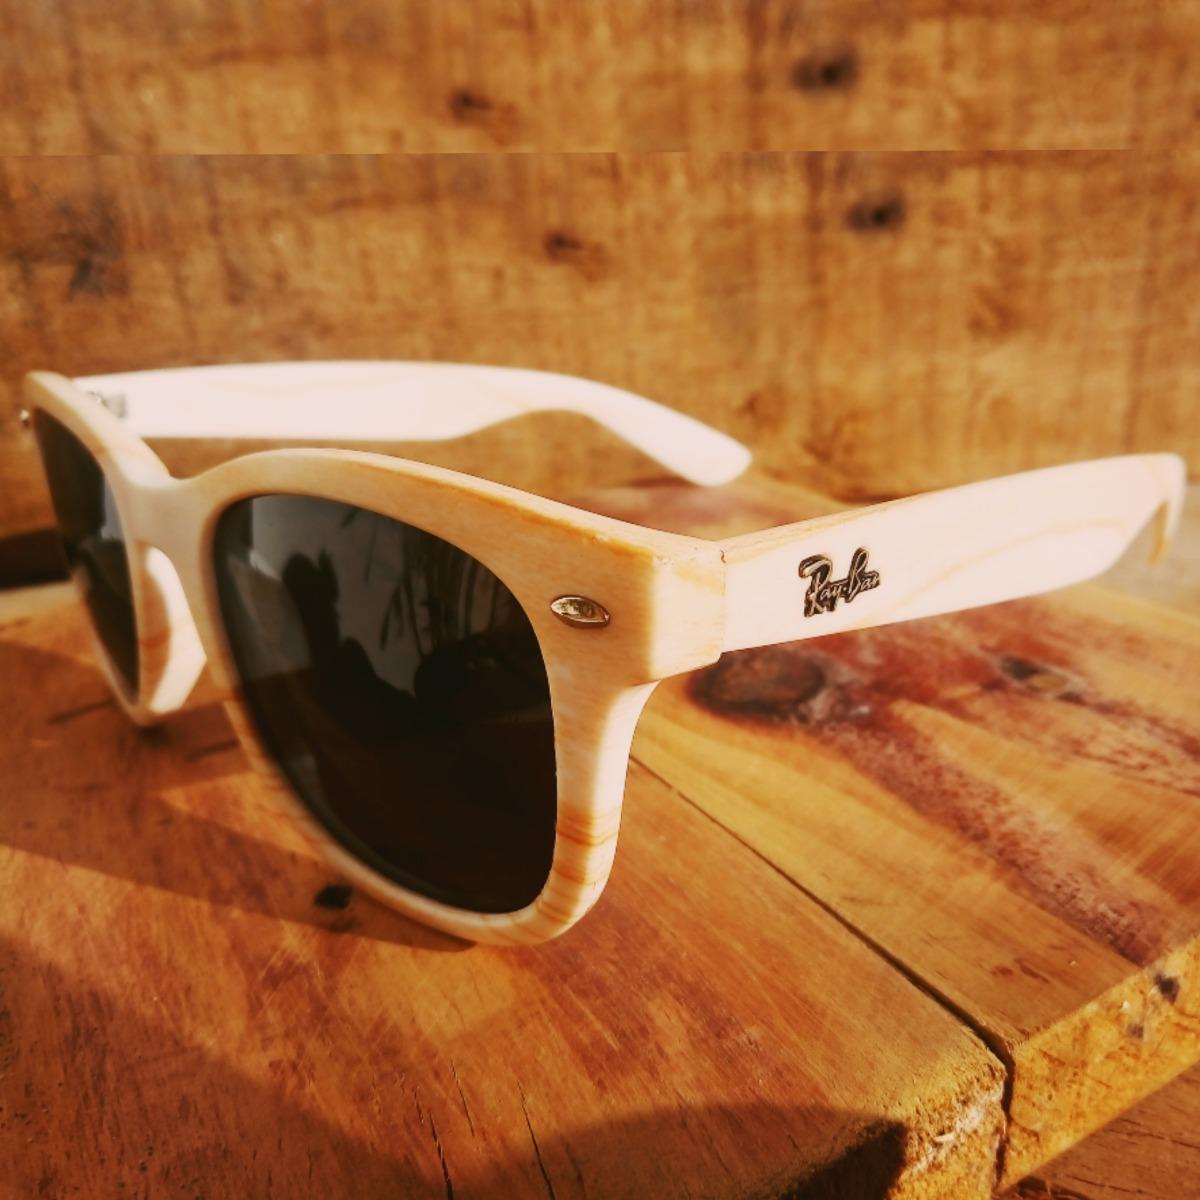 18fc321c7 Oculos Ray Ban Rb2140 Wayfarer Efeito Madeira Polarizado - R$ 120,00 ...